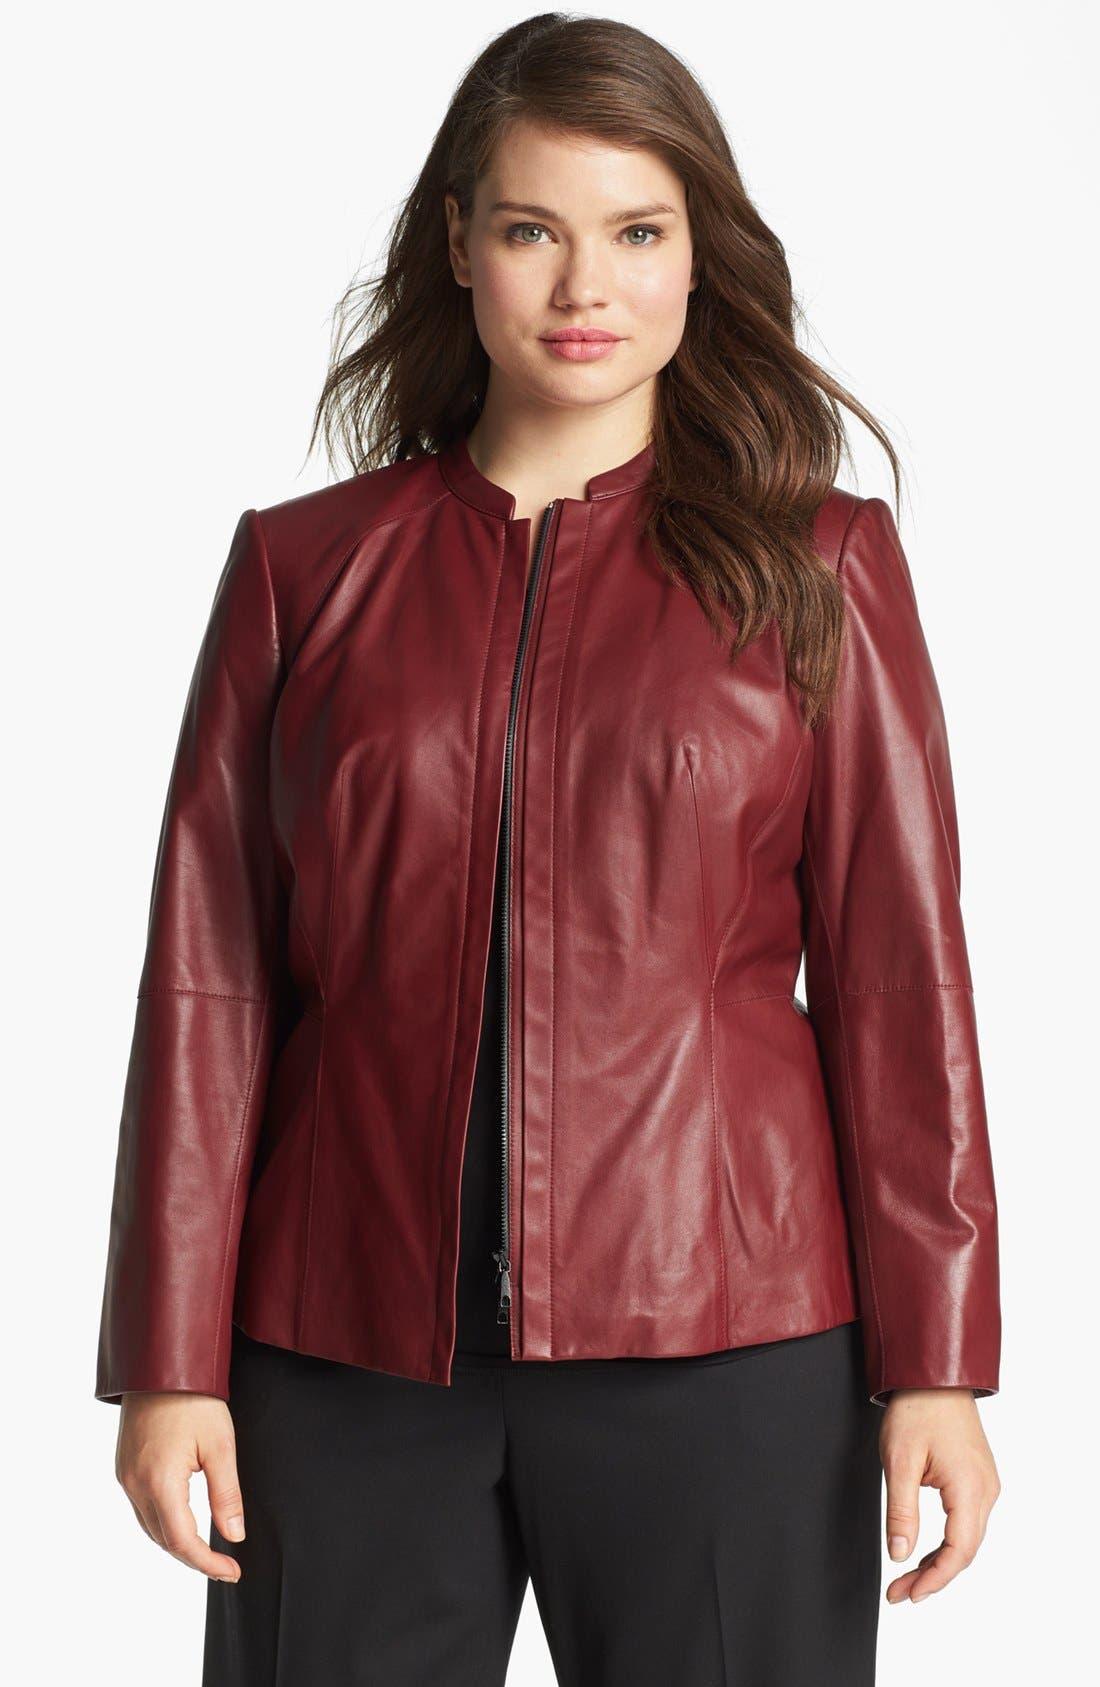 Main Image - Lafayette 148 New York Front Zip Leather Jacket (Plus Size)